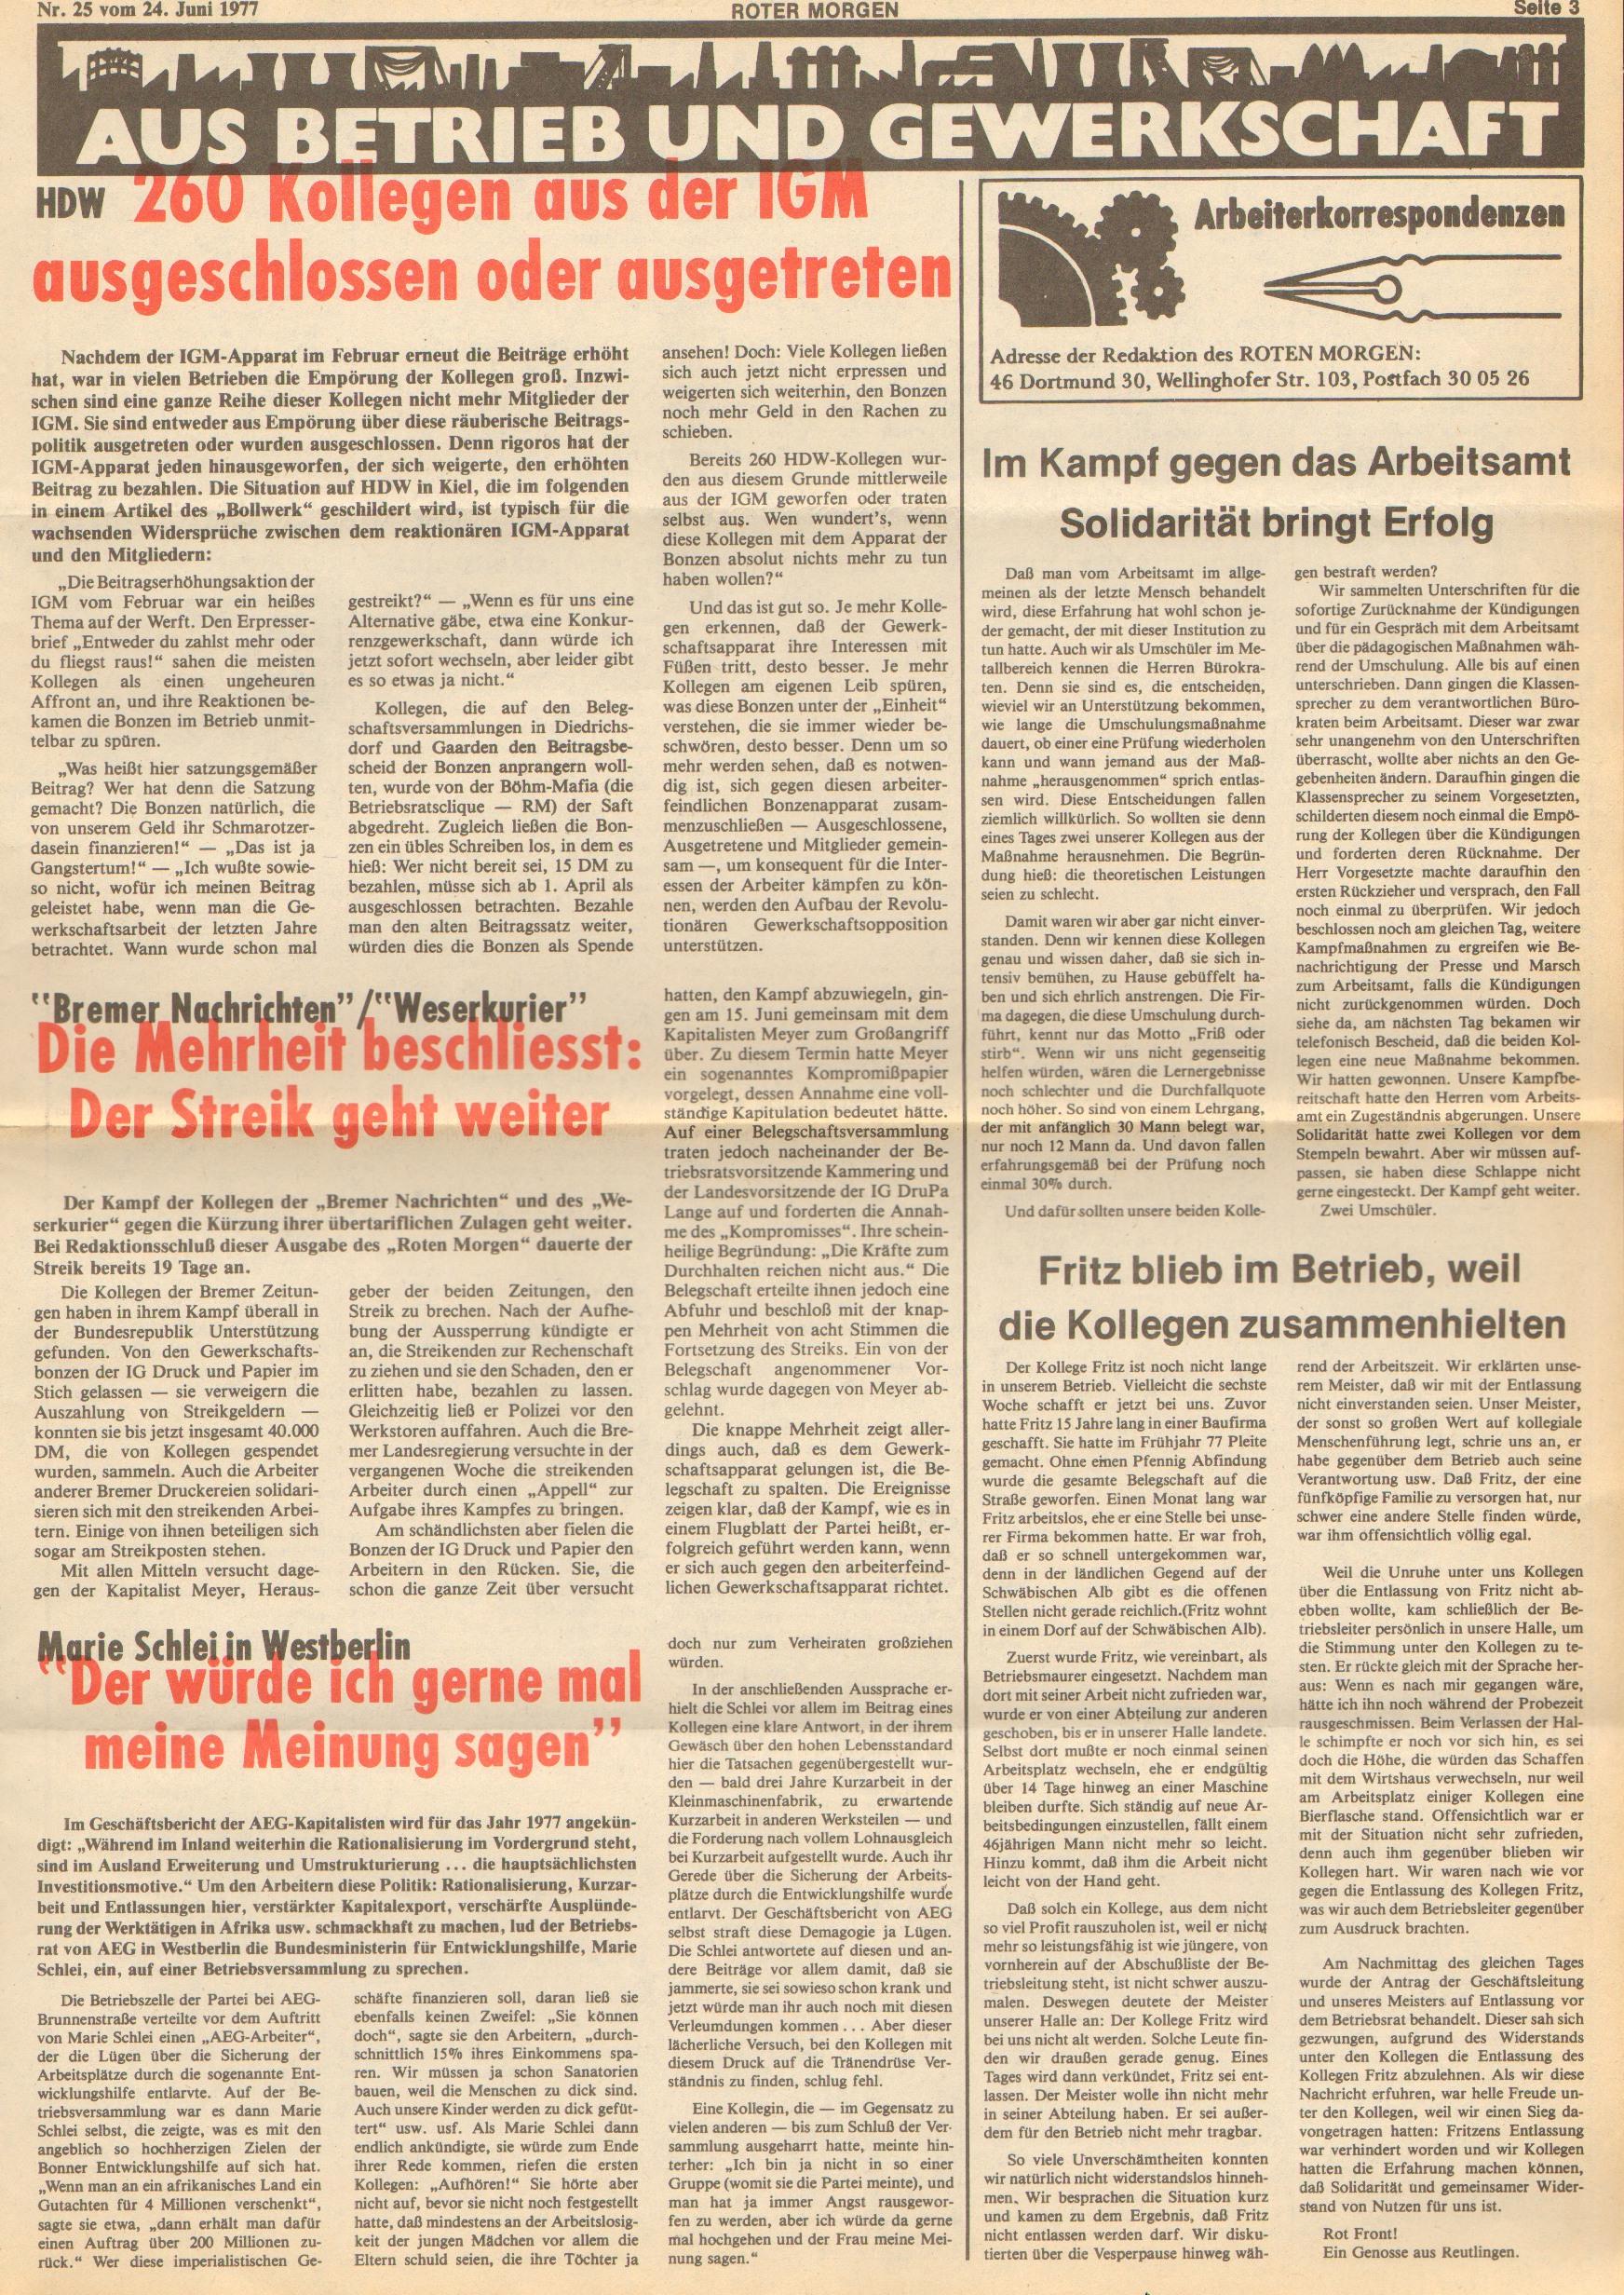 Roter Morgen, 11. Jg., 24. Juni 1977, Nr. 25, Seite 3